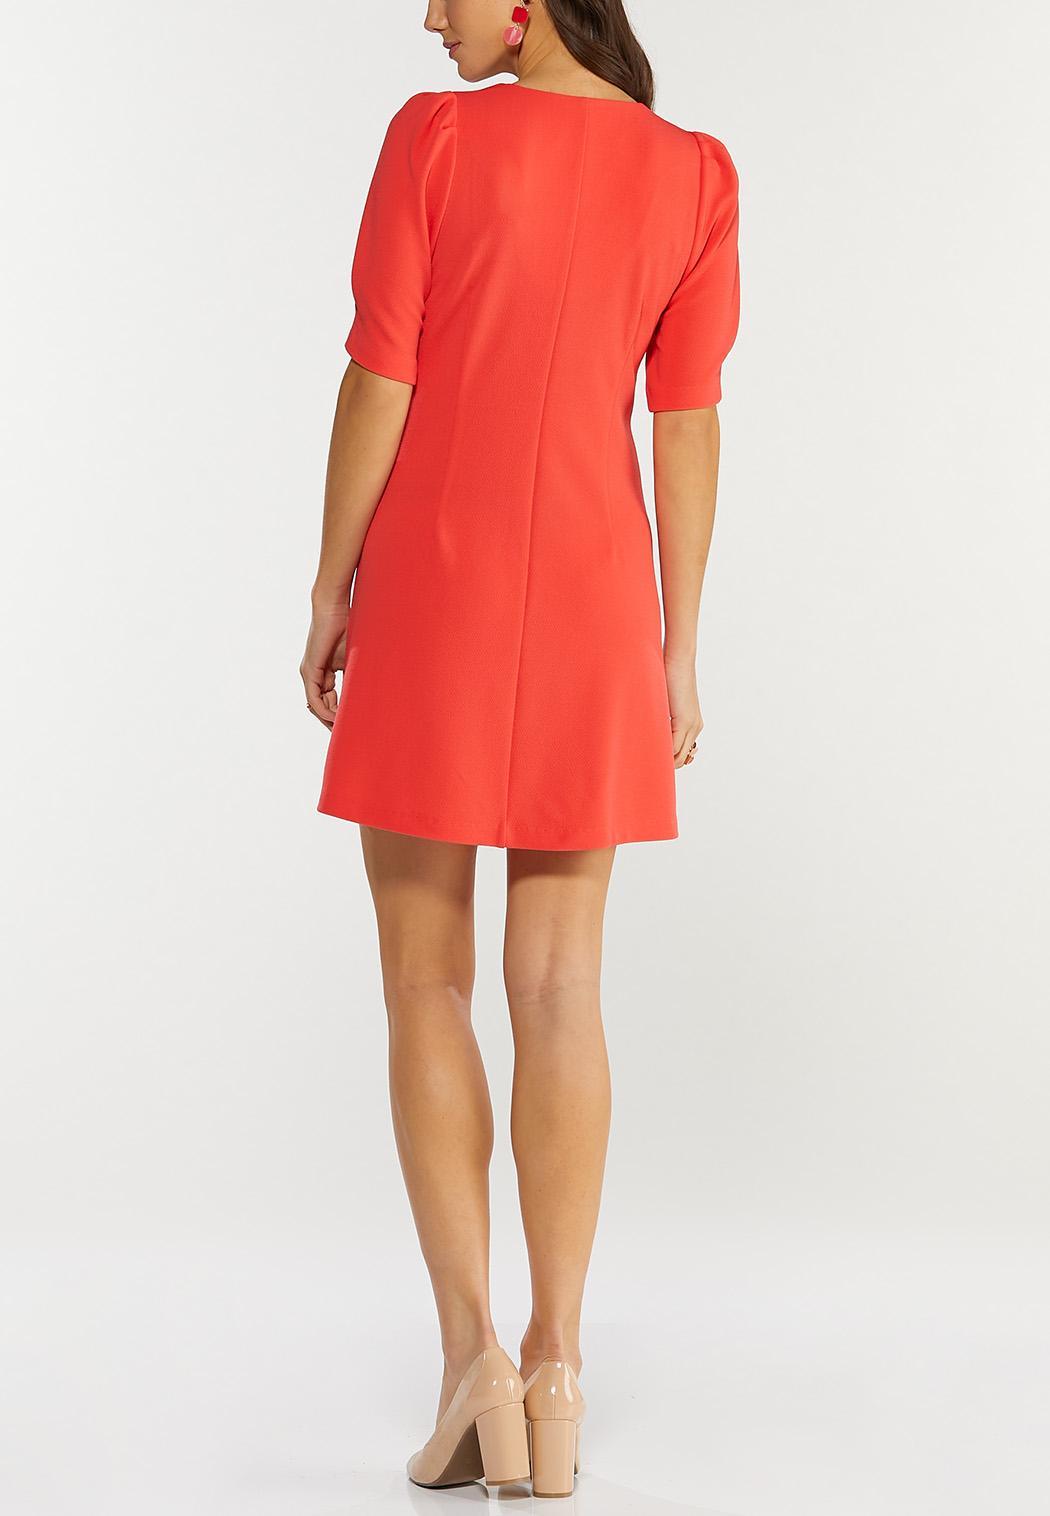 Plus Size Spice Coral Swing Dress (Item #44467322)